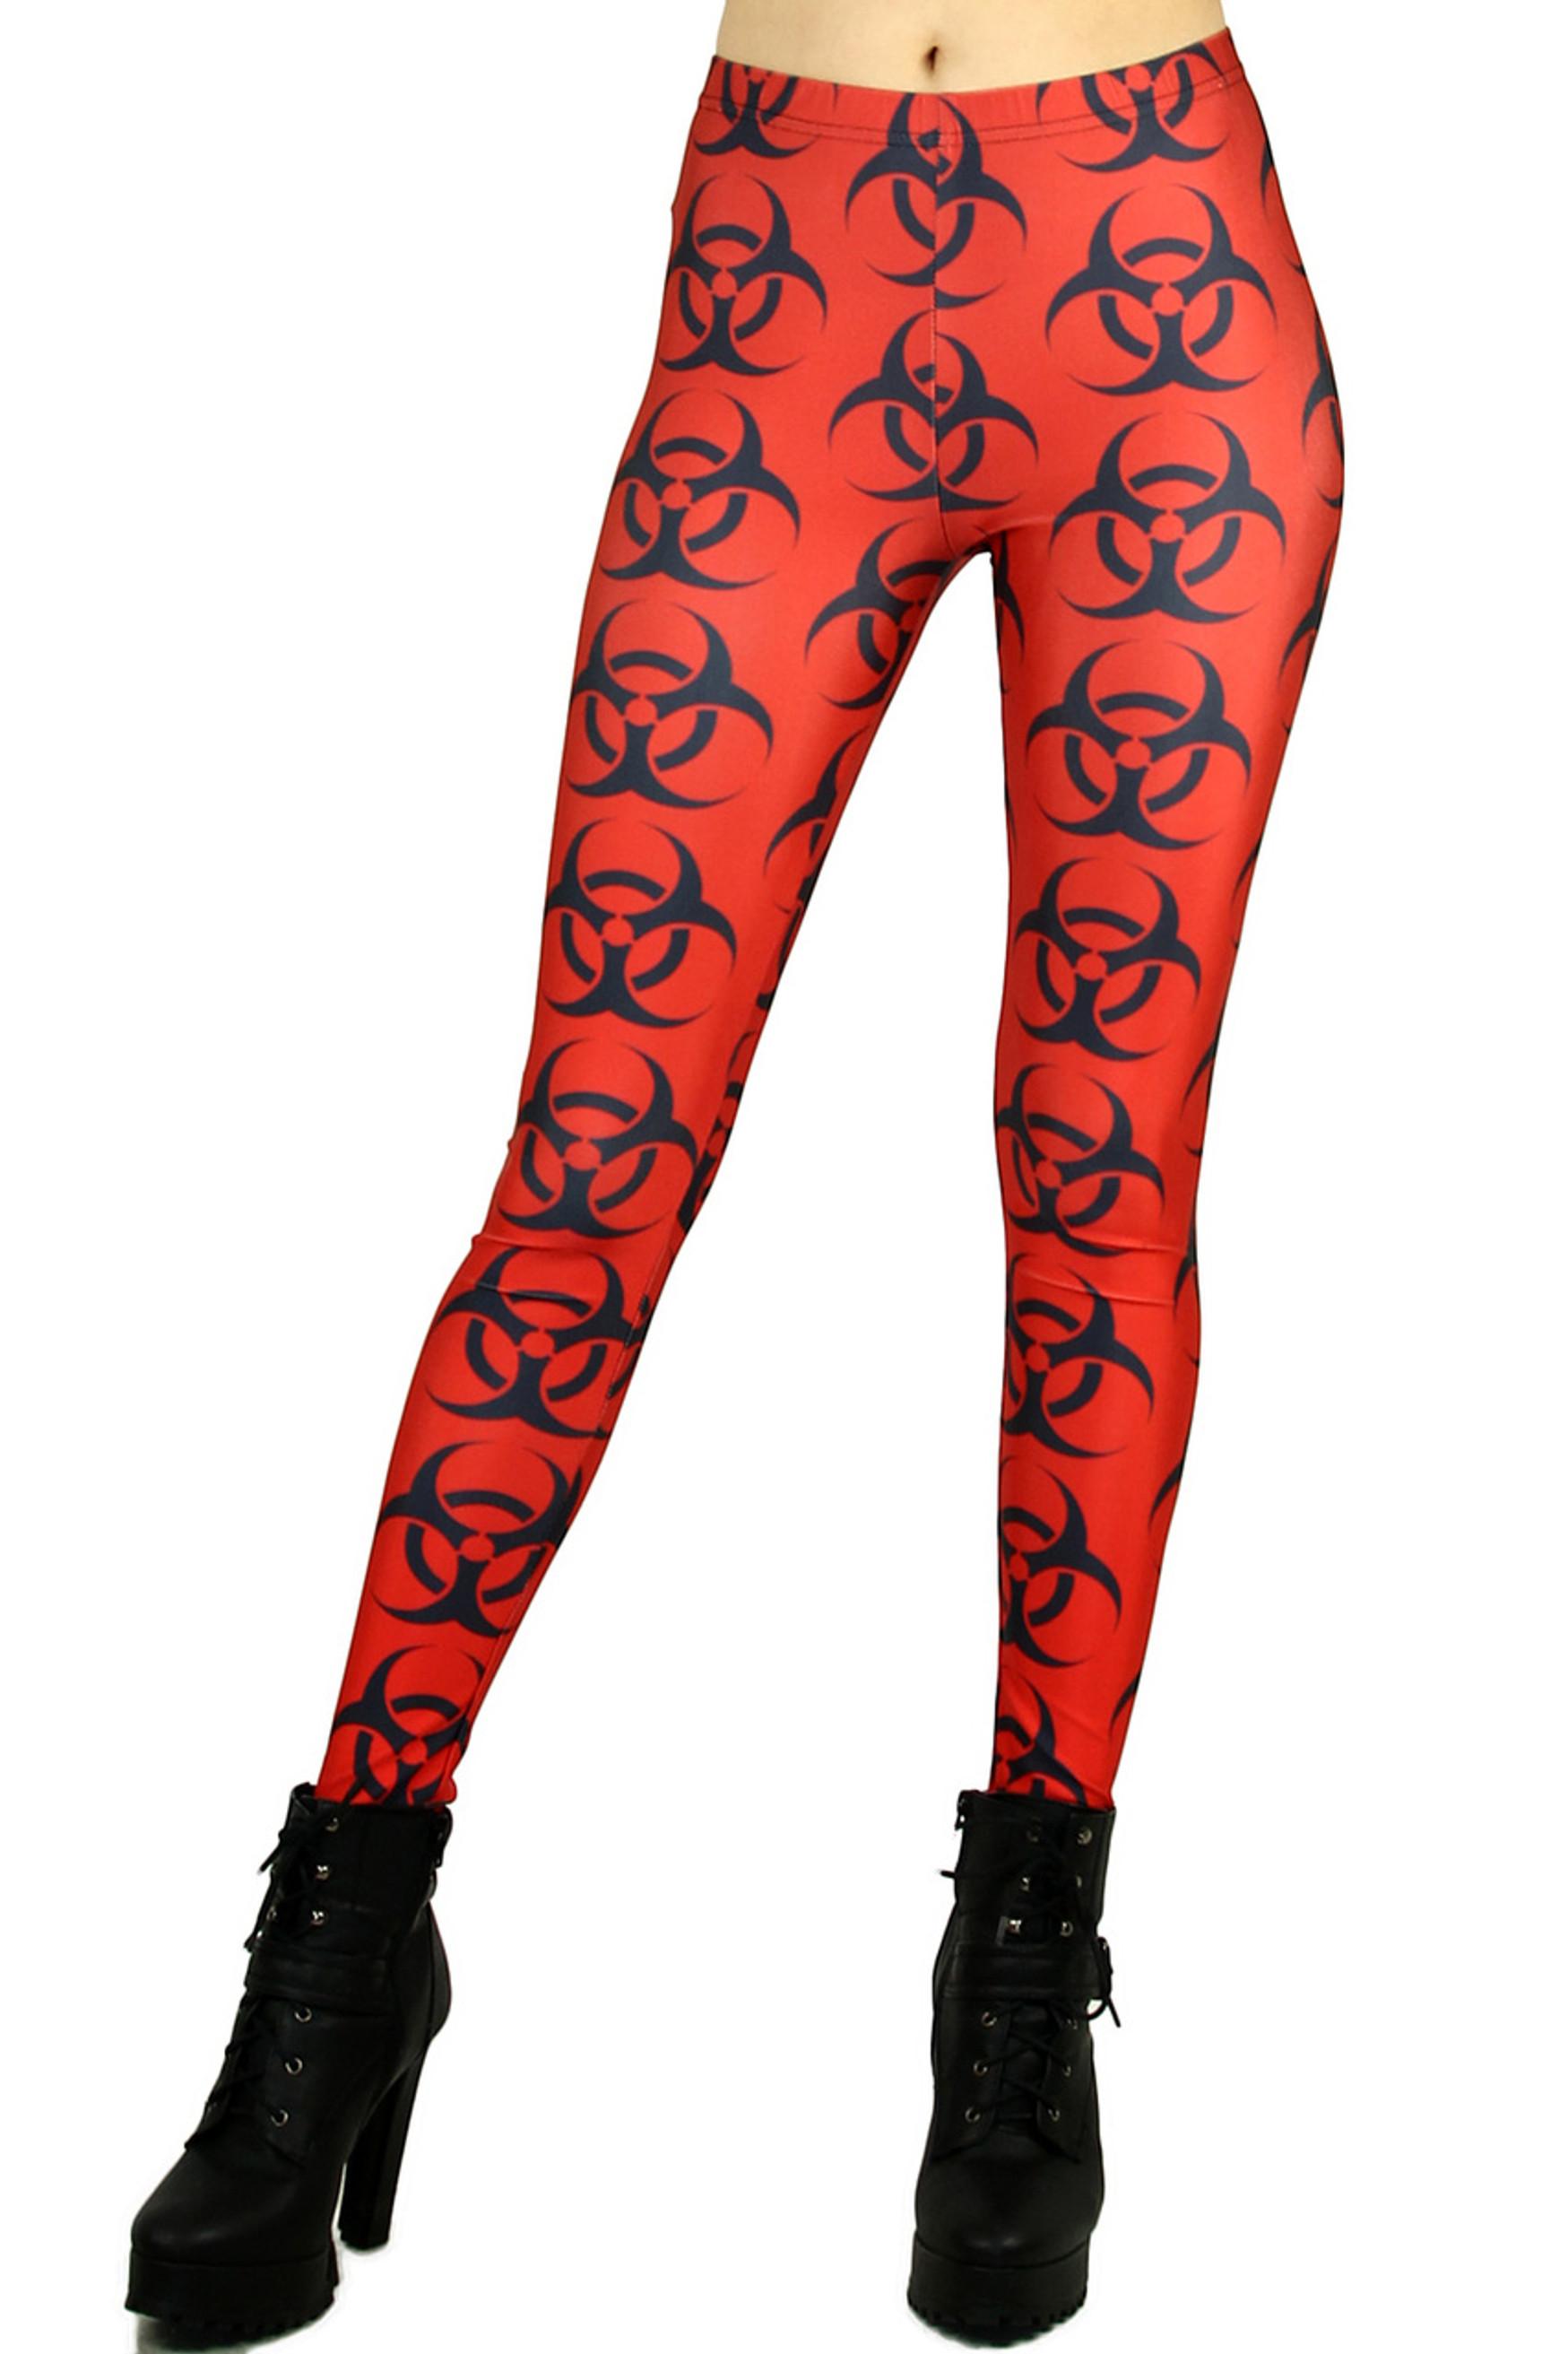 Red Bio Hazard Leggings